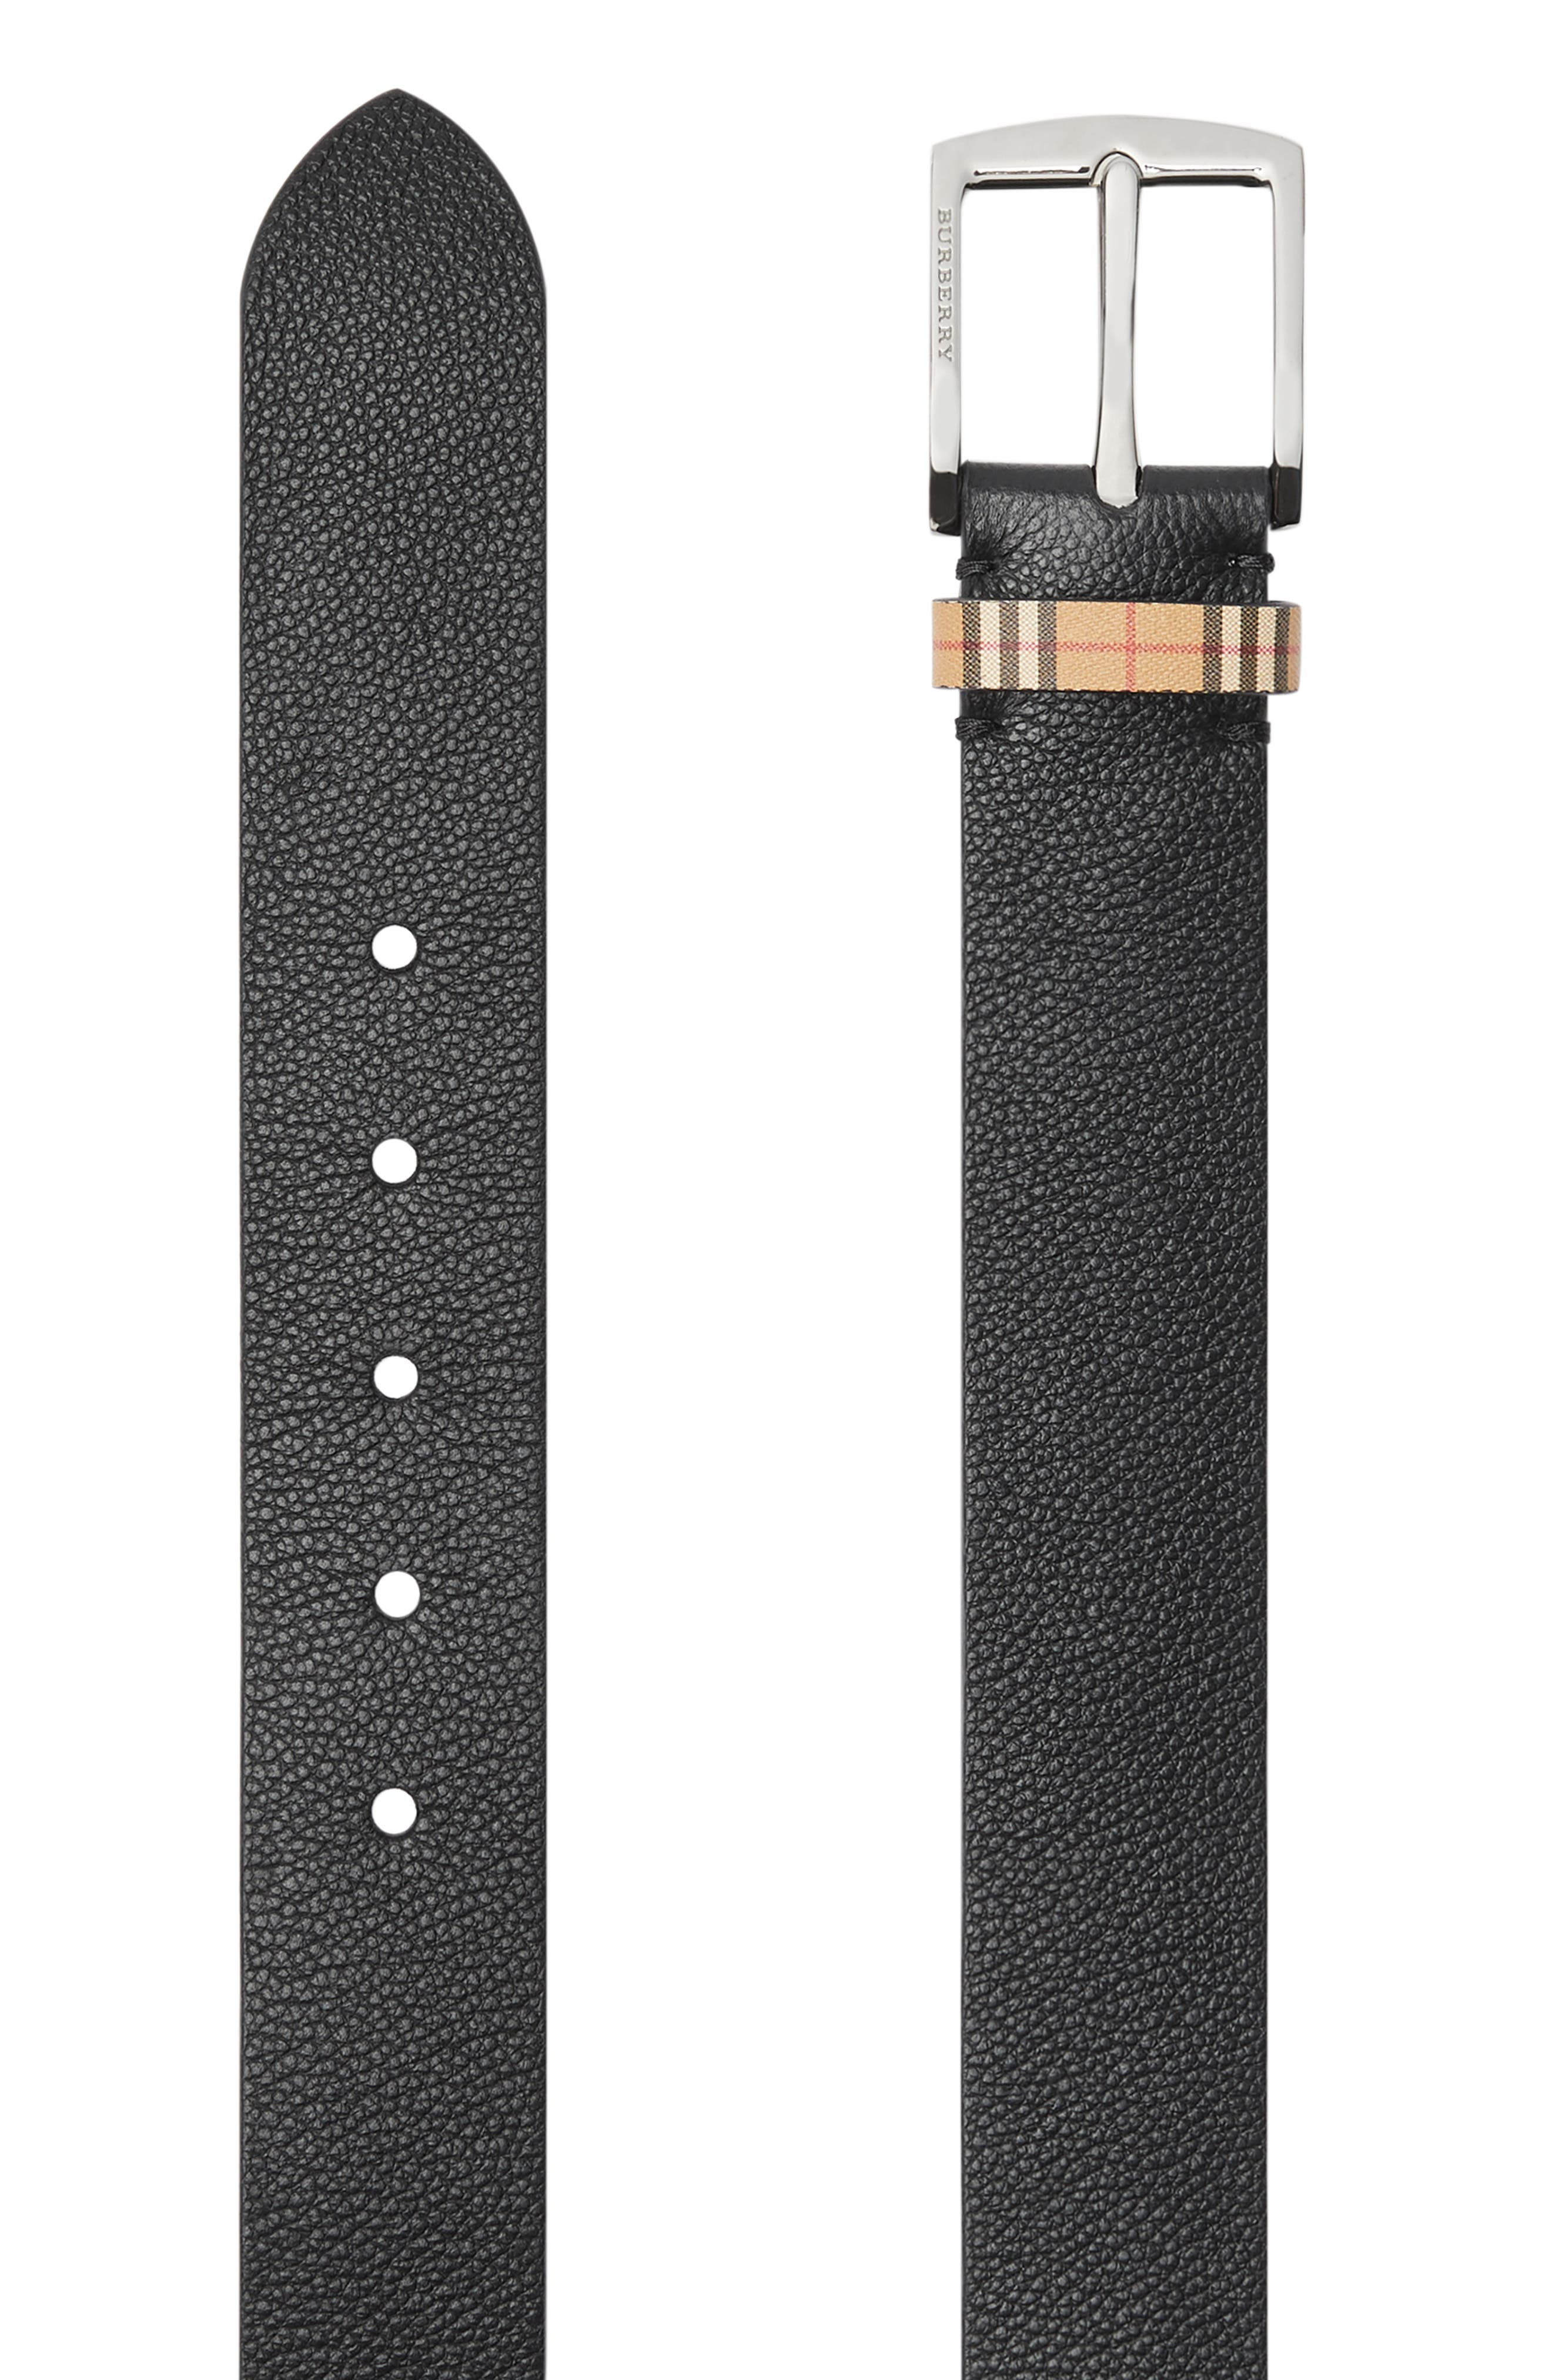 BURBERRY,                             Grainy Leather Belt,                             Alternate thumbnail 4, color,                             BLACK